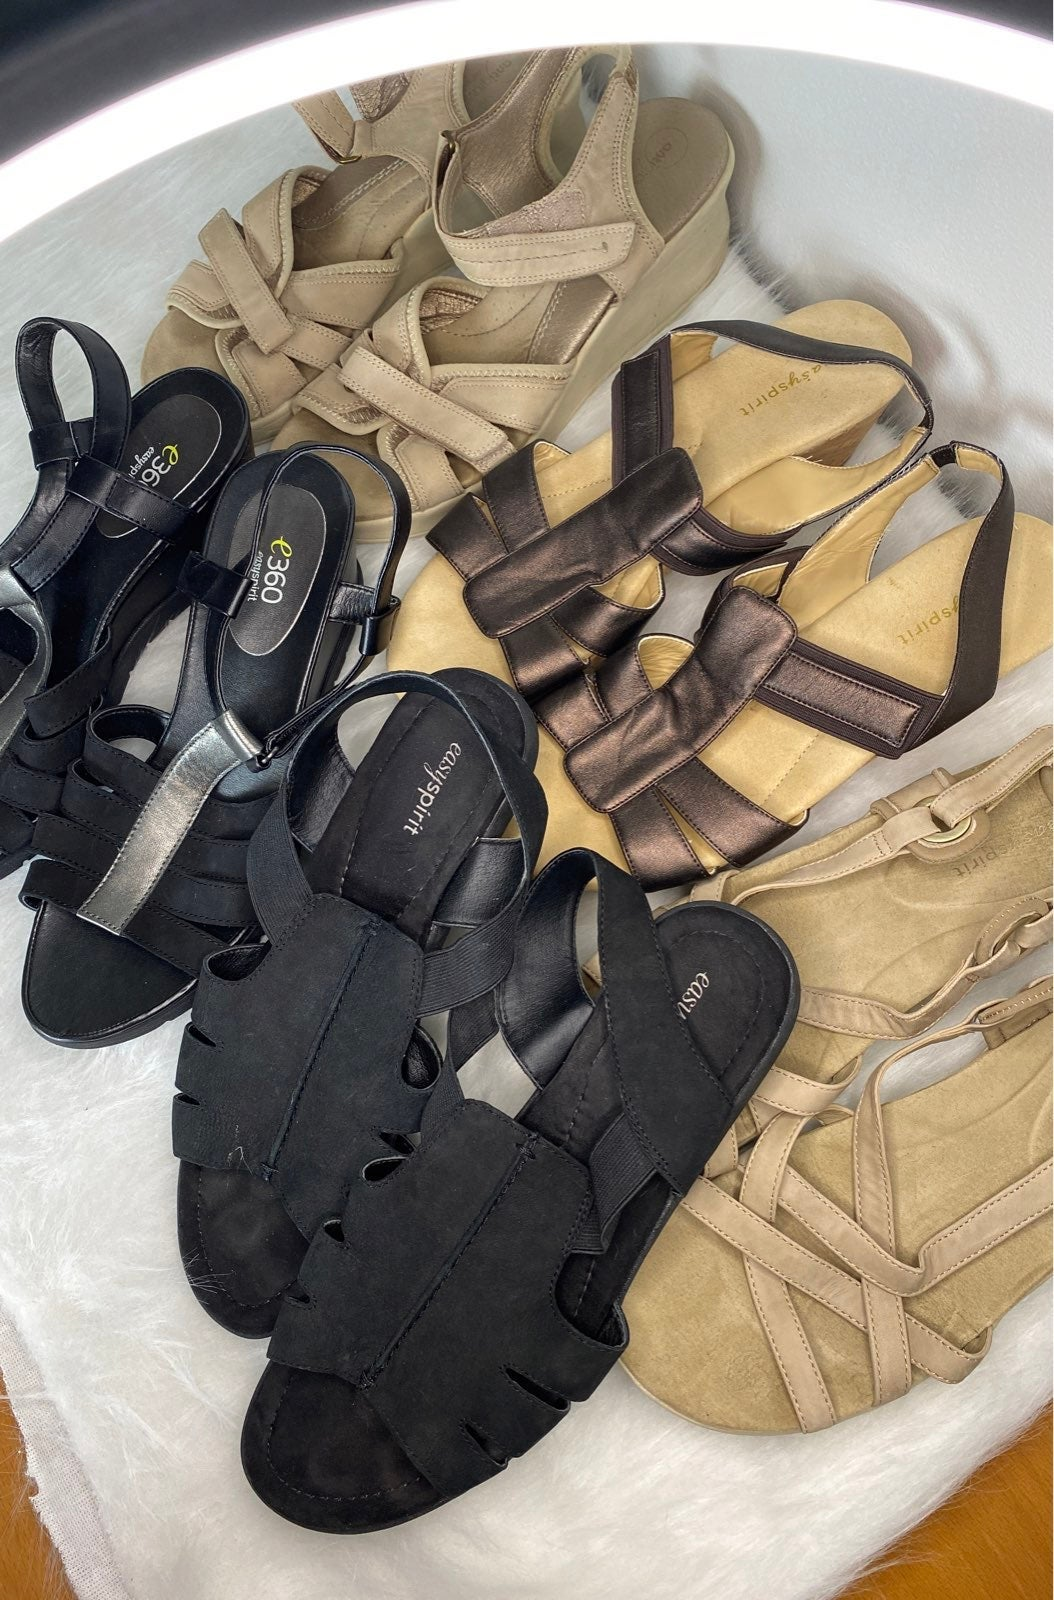 Easy spirit sandal lot ~ 5 pairs!